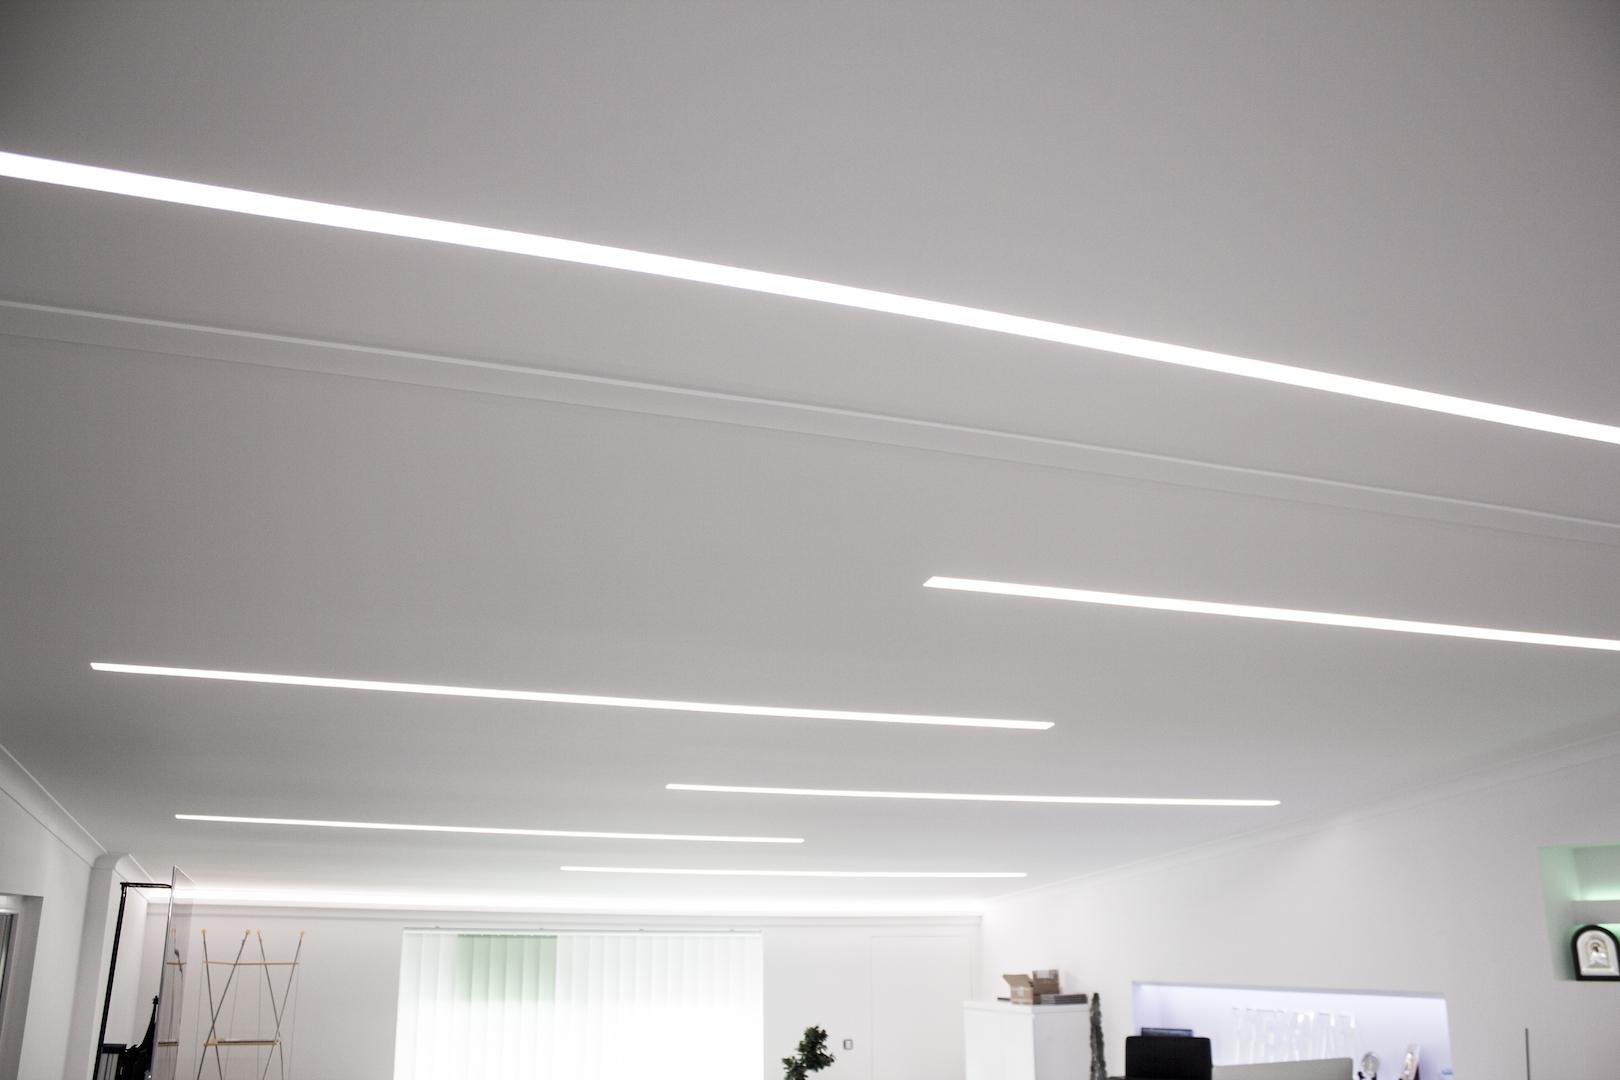 KD402 indirekte Beleuchtung 1,15 m lichtundurchl/ässig Rigips Tesori Trockenbau XPS 150x55mm LED Profil